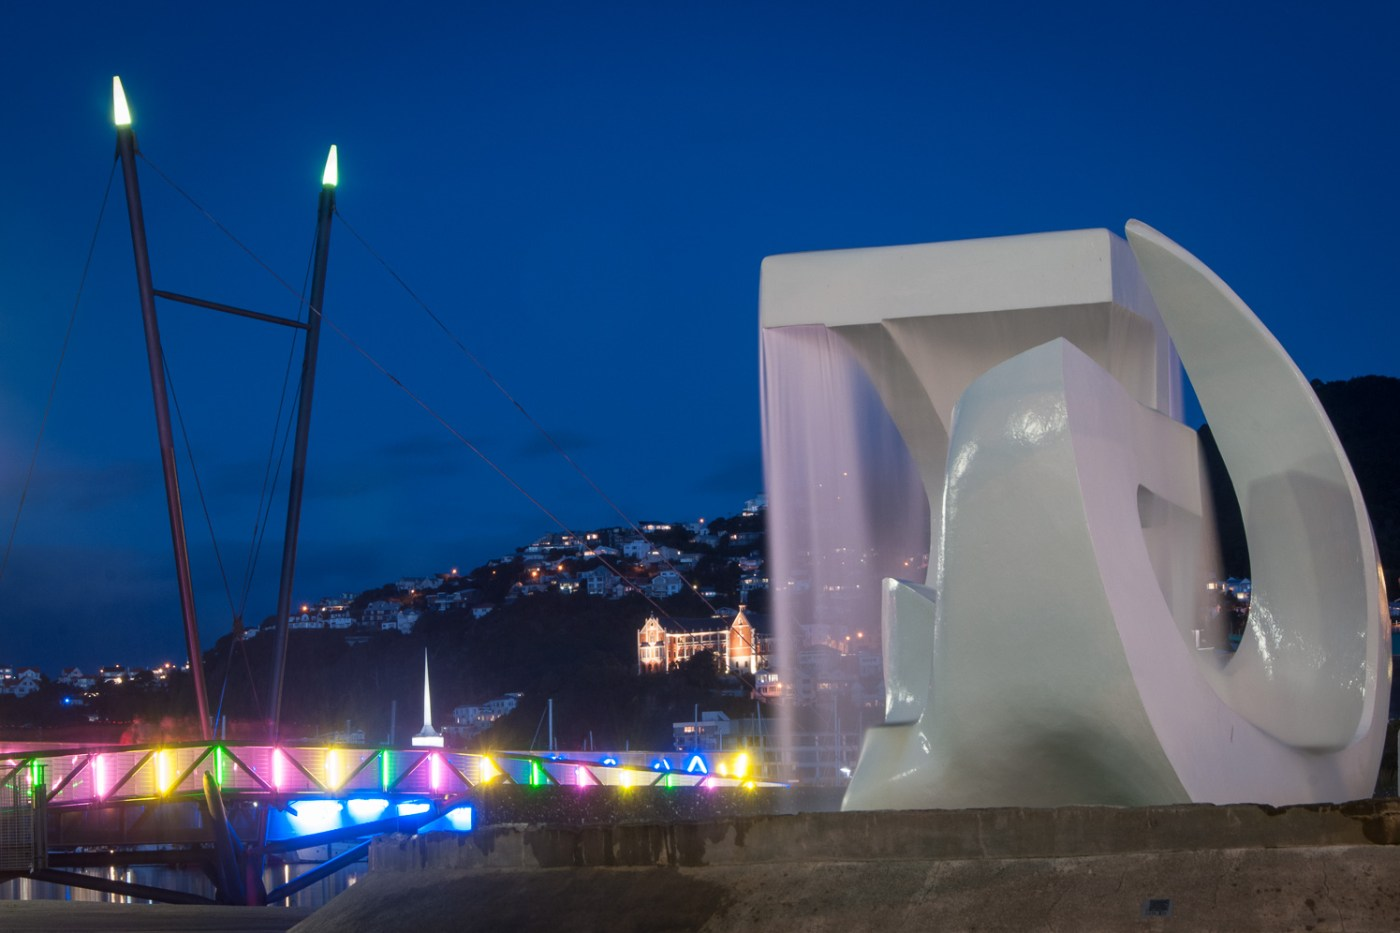 Wellington Waterfront Footbridge and Sculpture